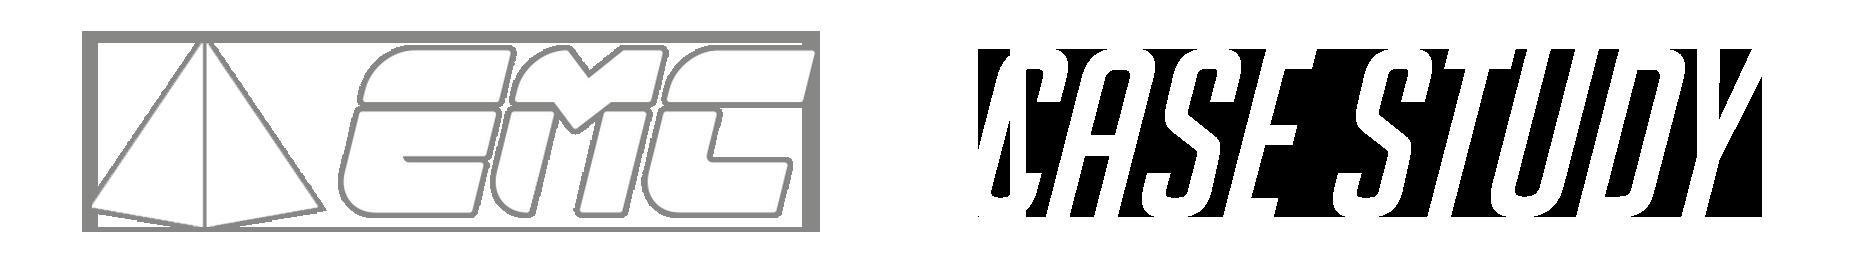 EMC-logo1